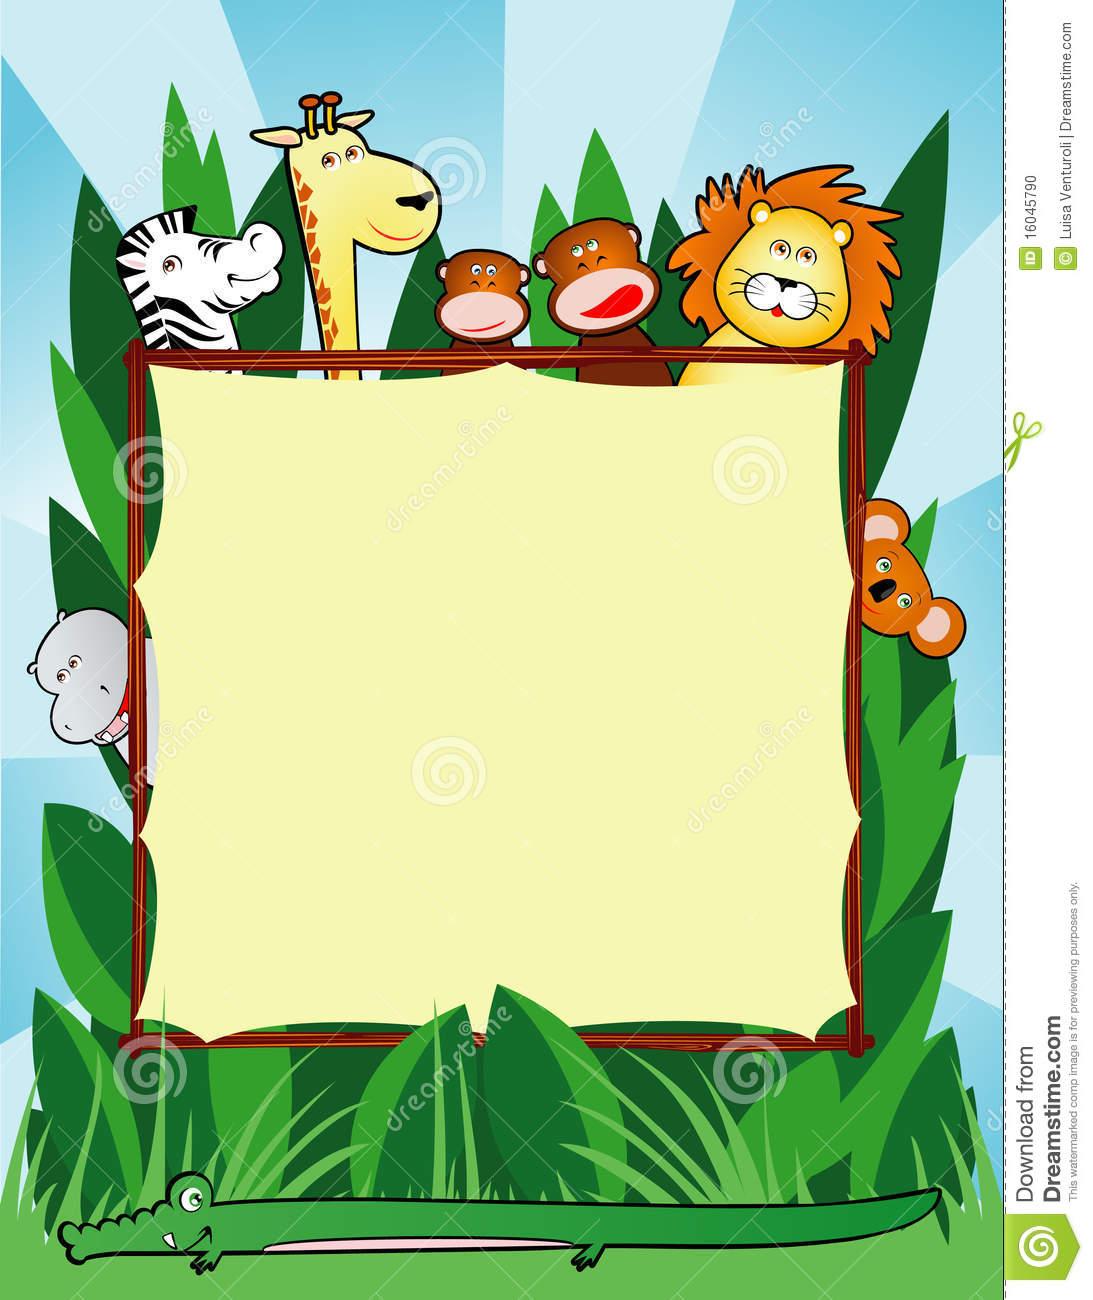 1093x1300 Wallpaper Clipart Jungle Animal